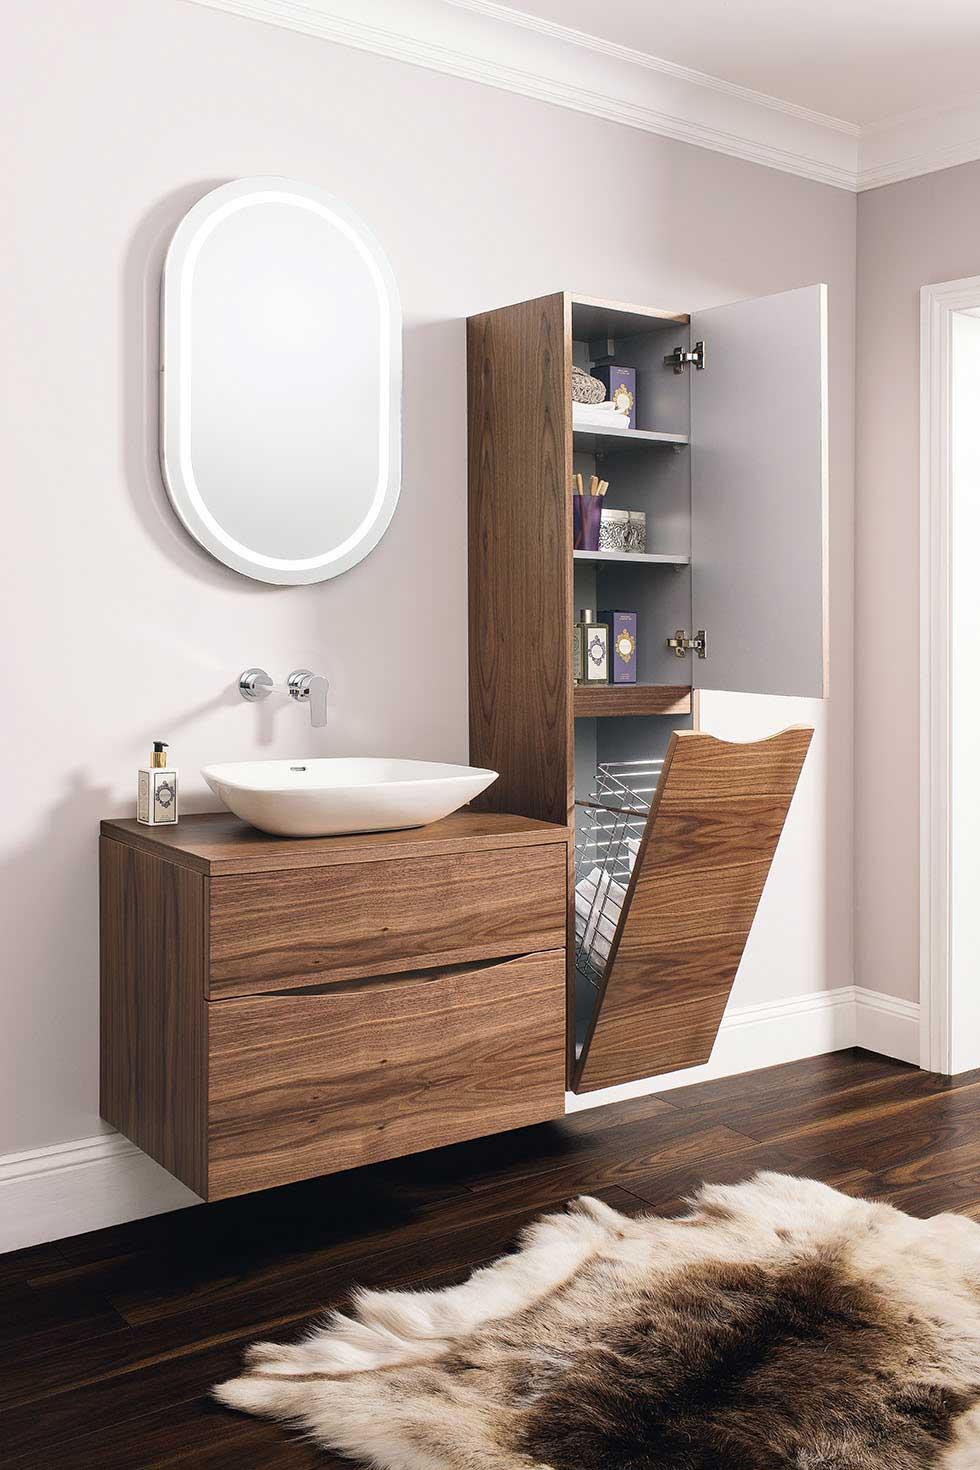 Wall Hung Modular Units Bathroom Storage